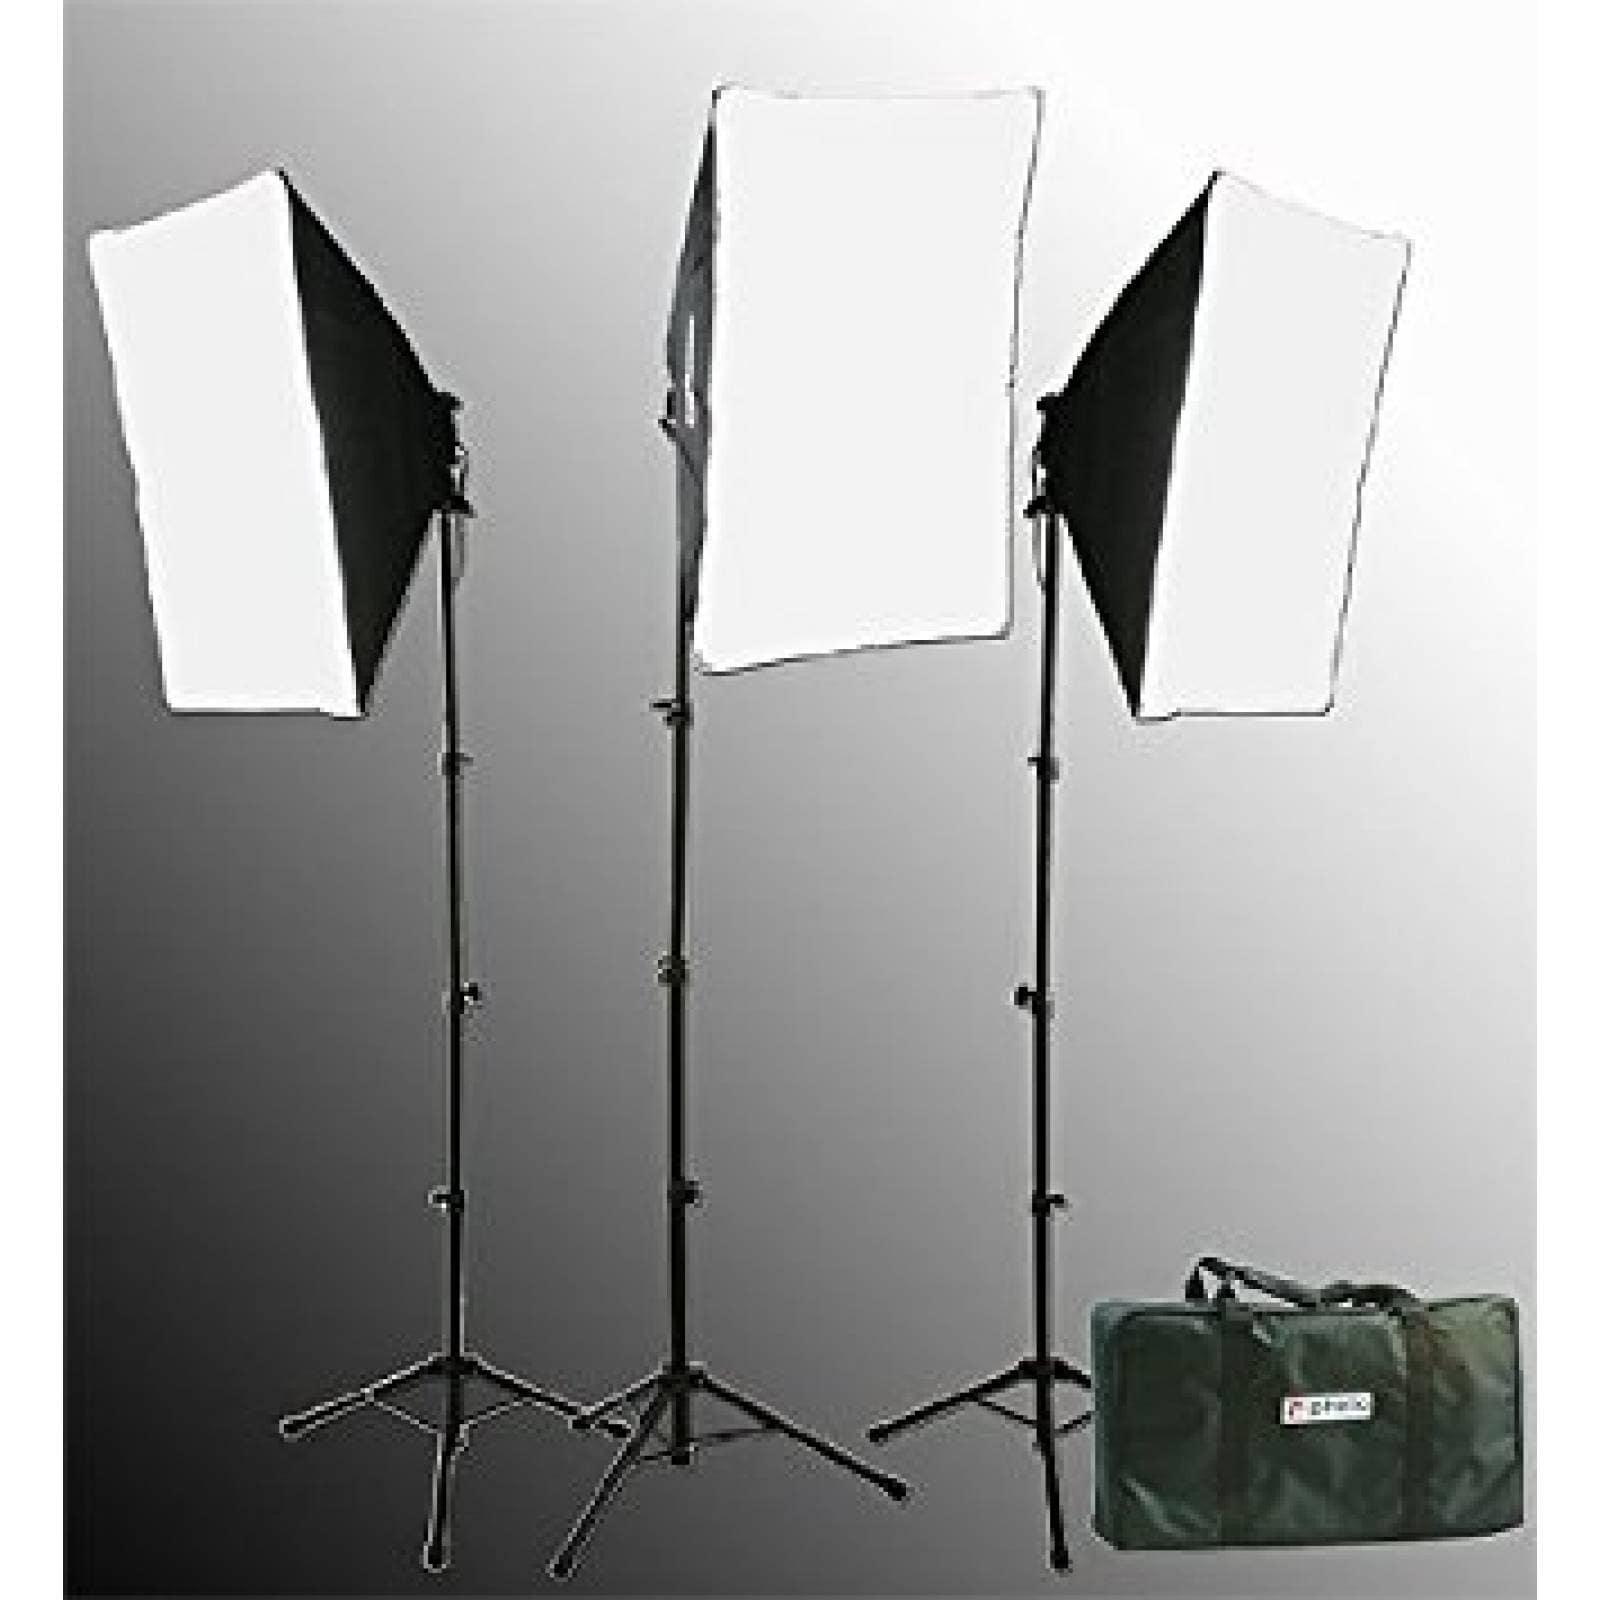 Fancierstudio 2400 Watts iluminación kit softbox kit  -Negro